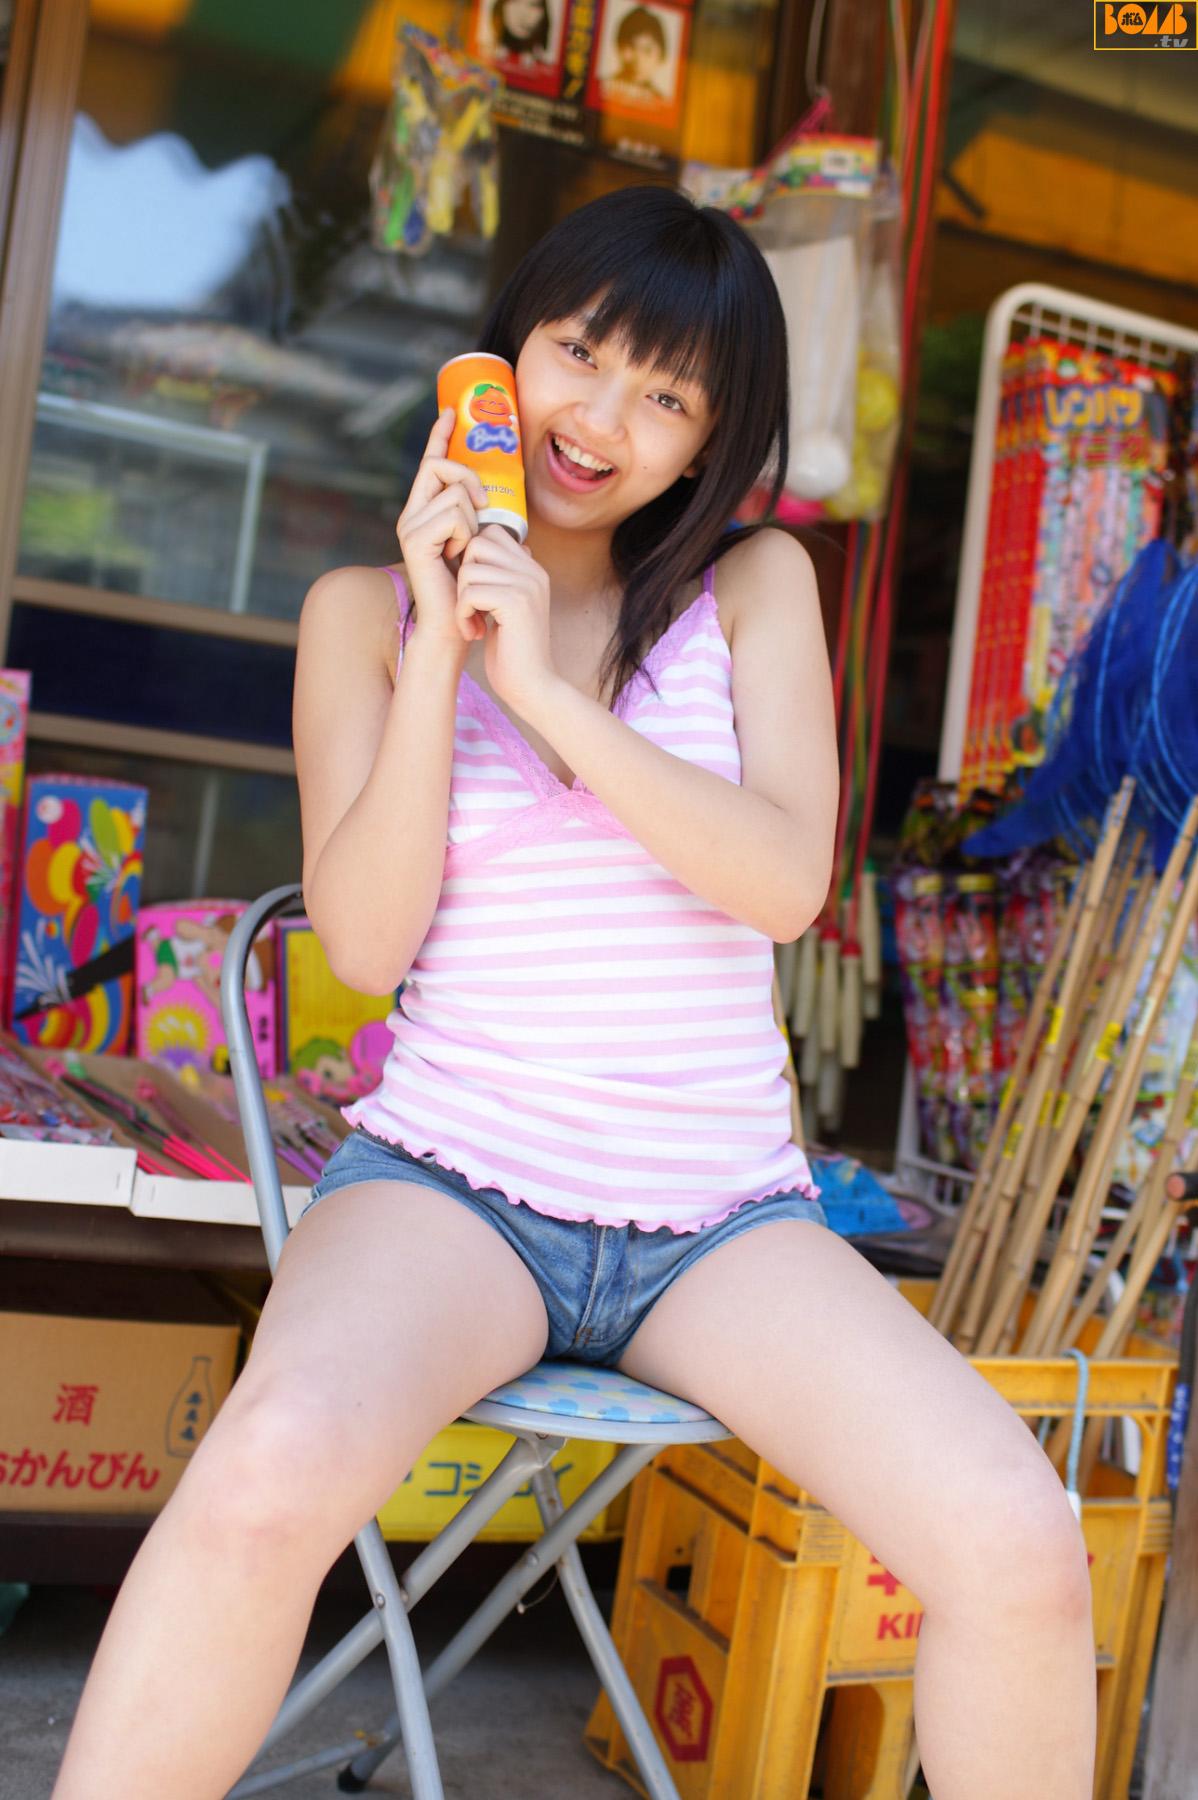 Azusa Hibino - Bomb.tv Channel B 日美野梓 - idols